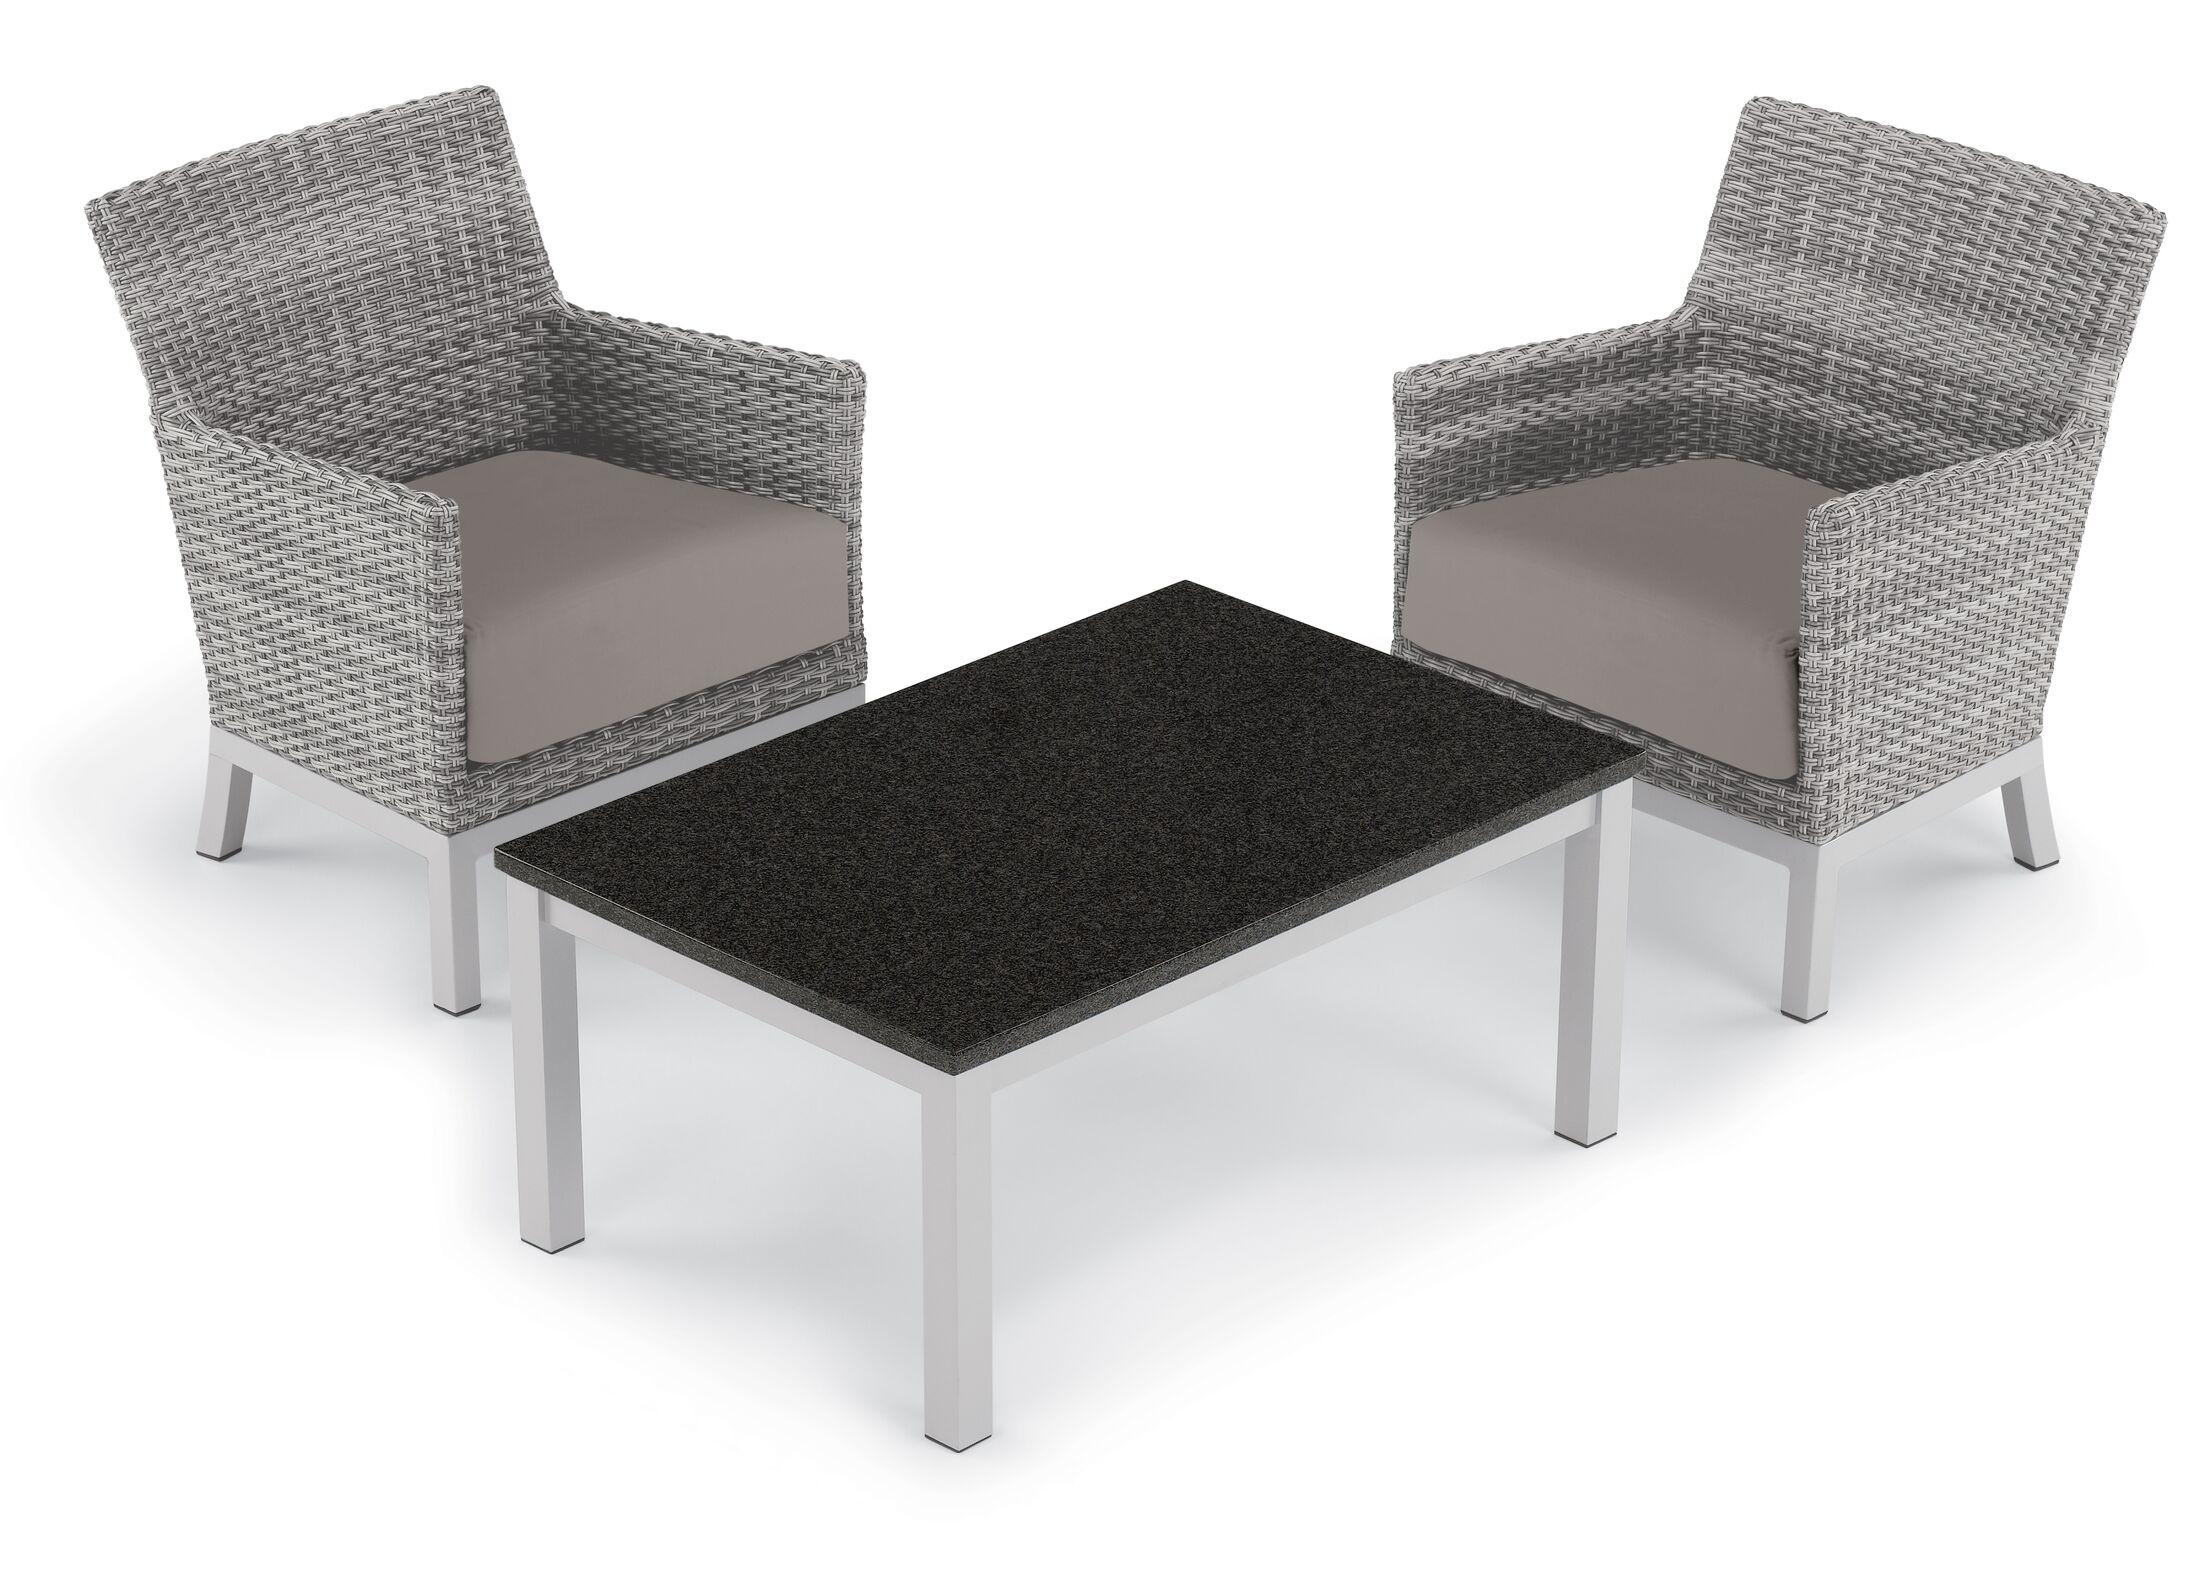 Saint-Pierre 3 Piece Club Rattan Conversation Set with Cushions Cushion Color: Stone